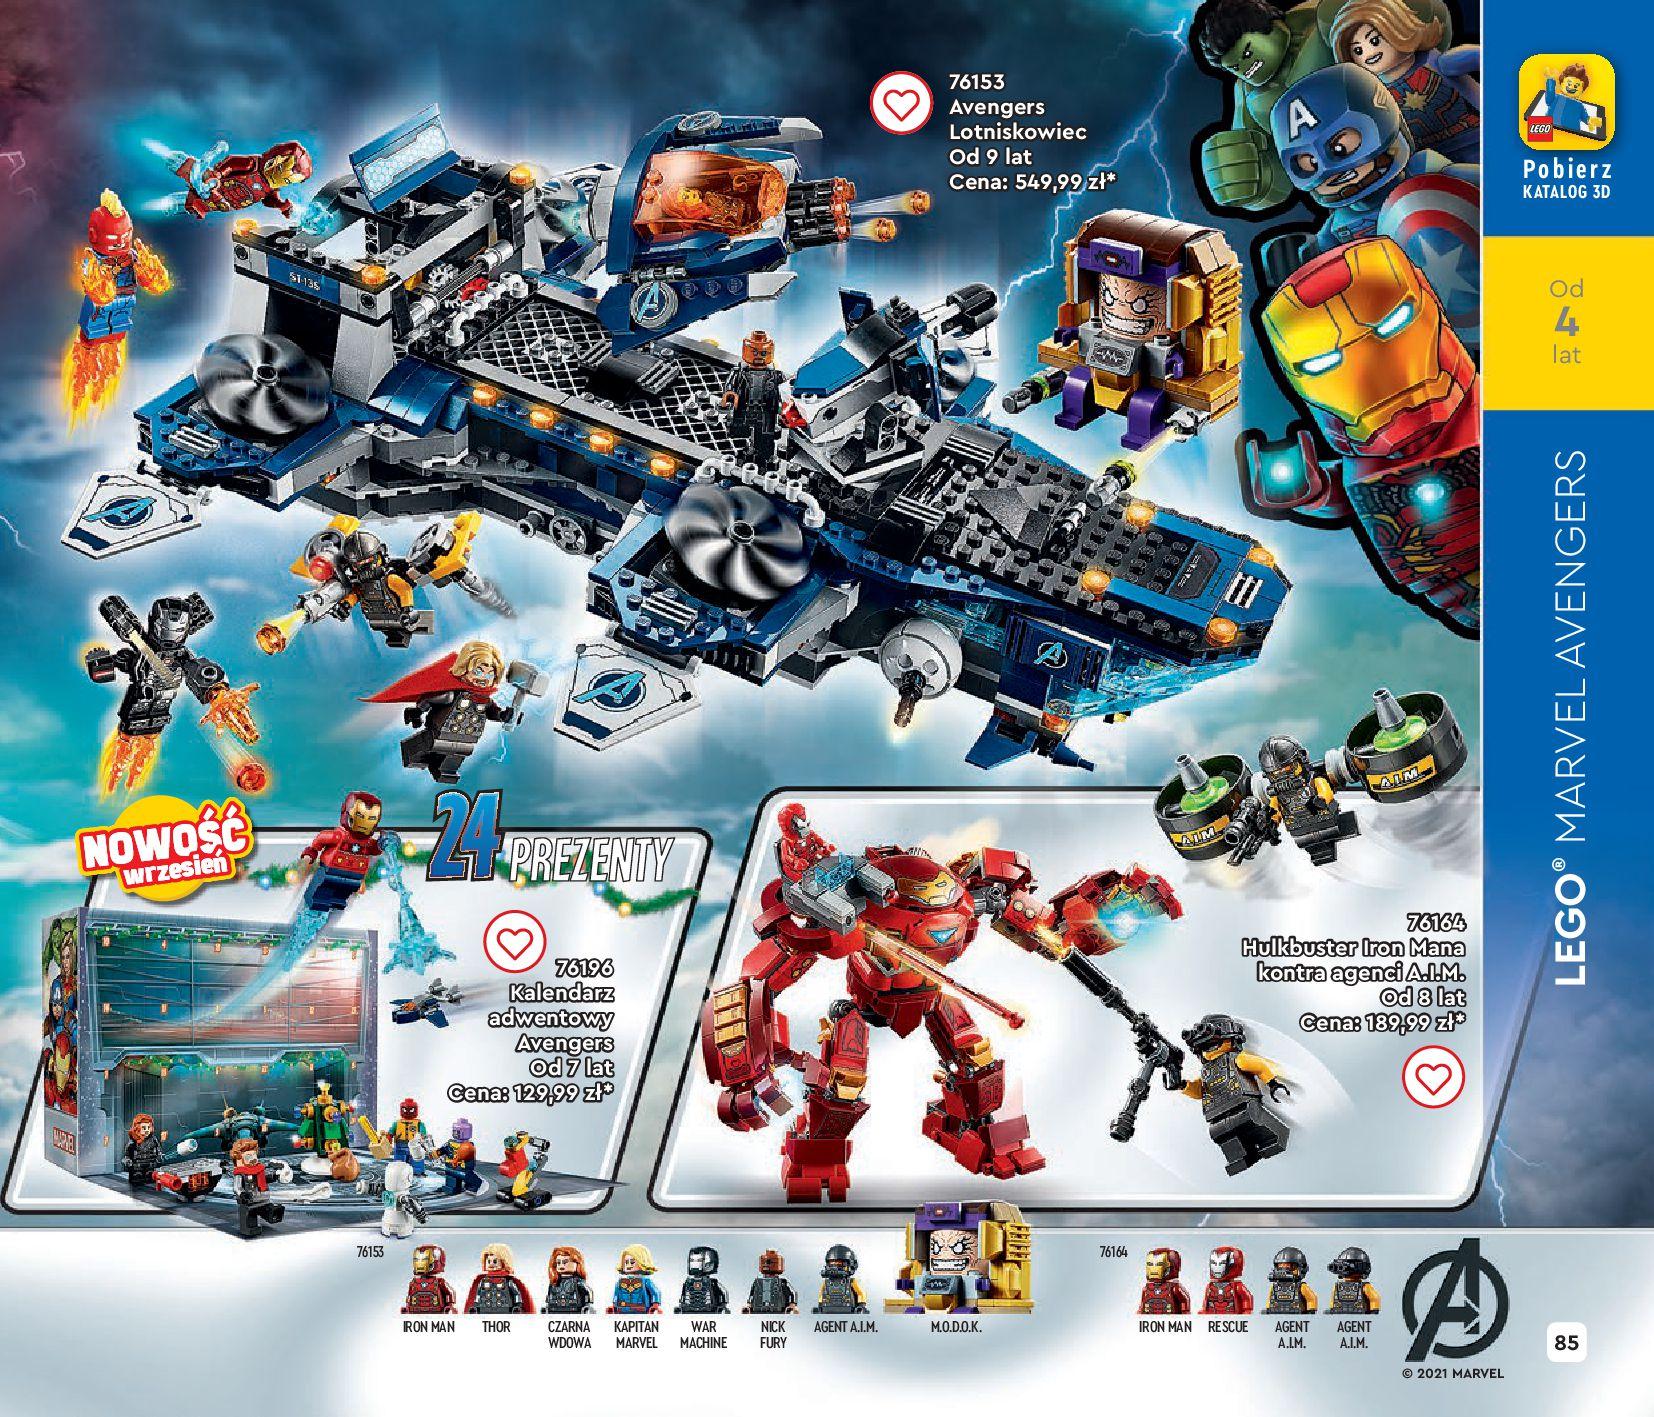 Gazetka LEGO: Gazetka LEGO - katalog 2021-06-30 page-85